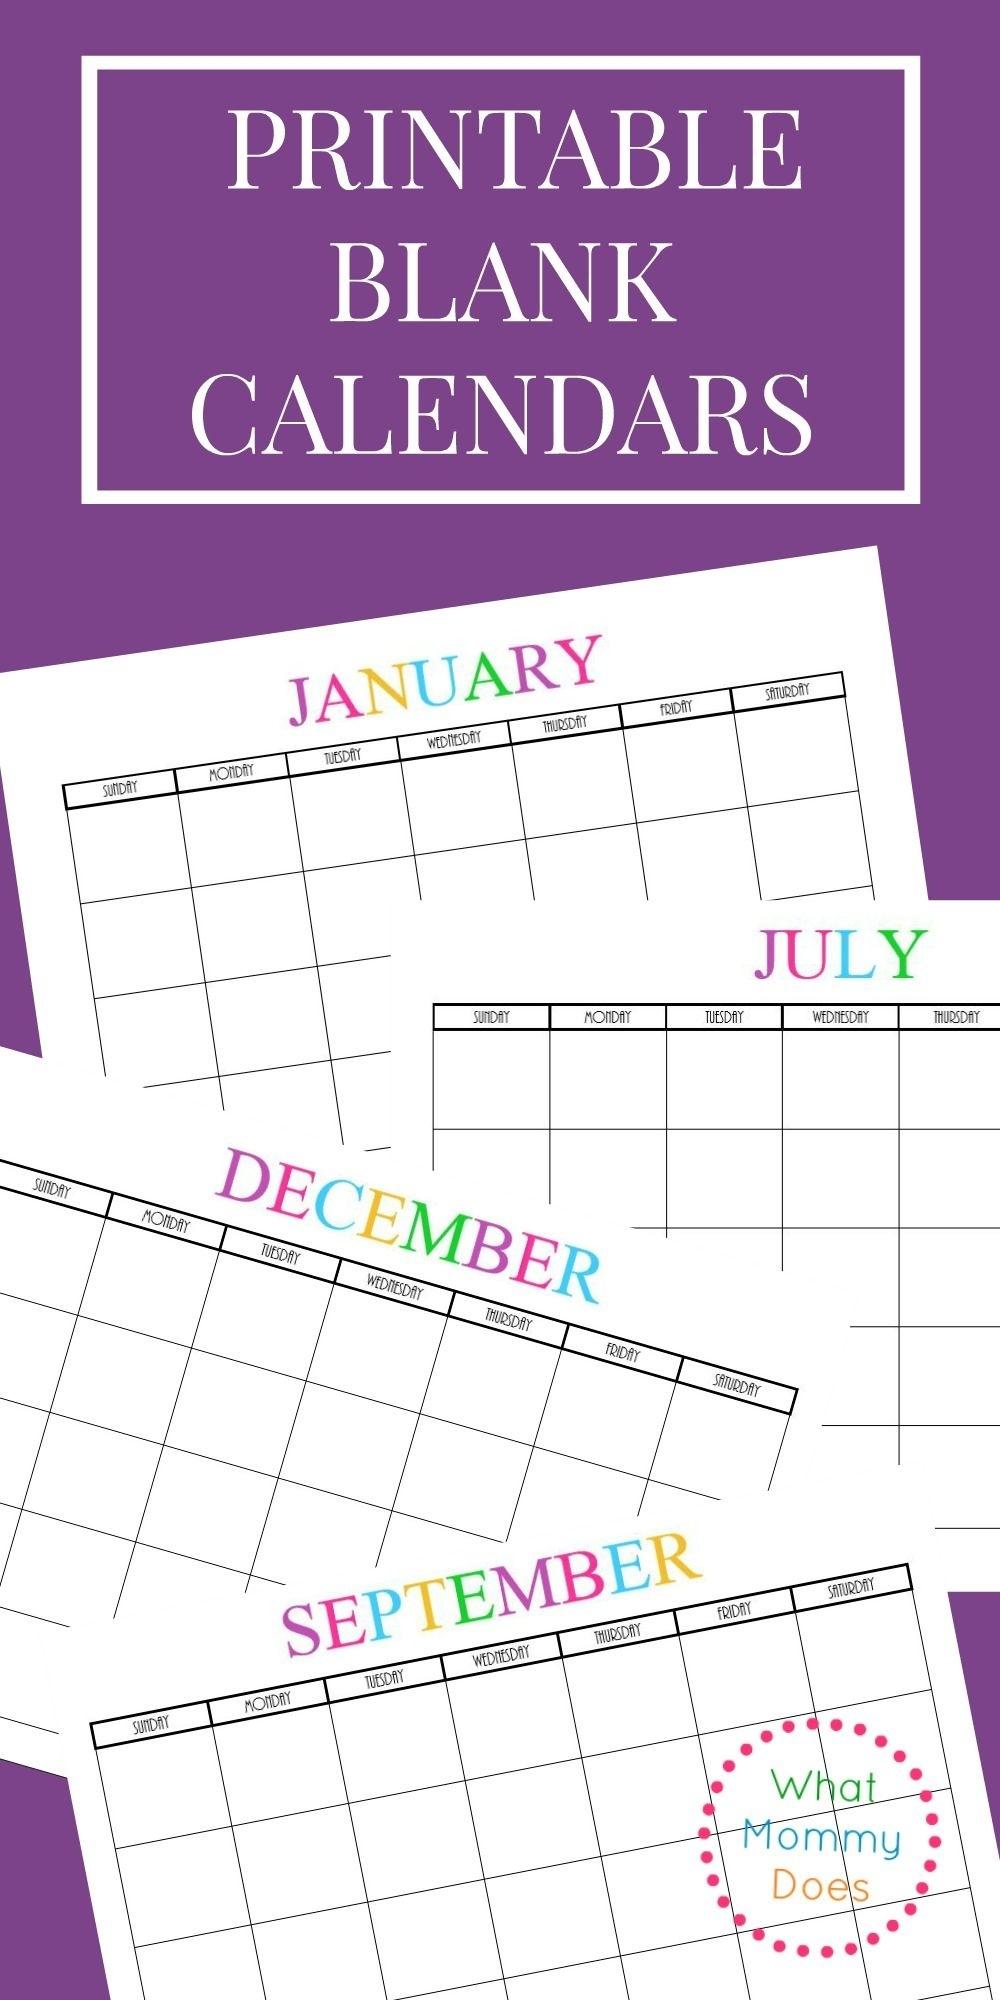 Free Printable Blank Monthly Calendars – 2018, 2019, 2020, 2021+ regarding Free Printable Calendars For Kindergarten 2019-2020